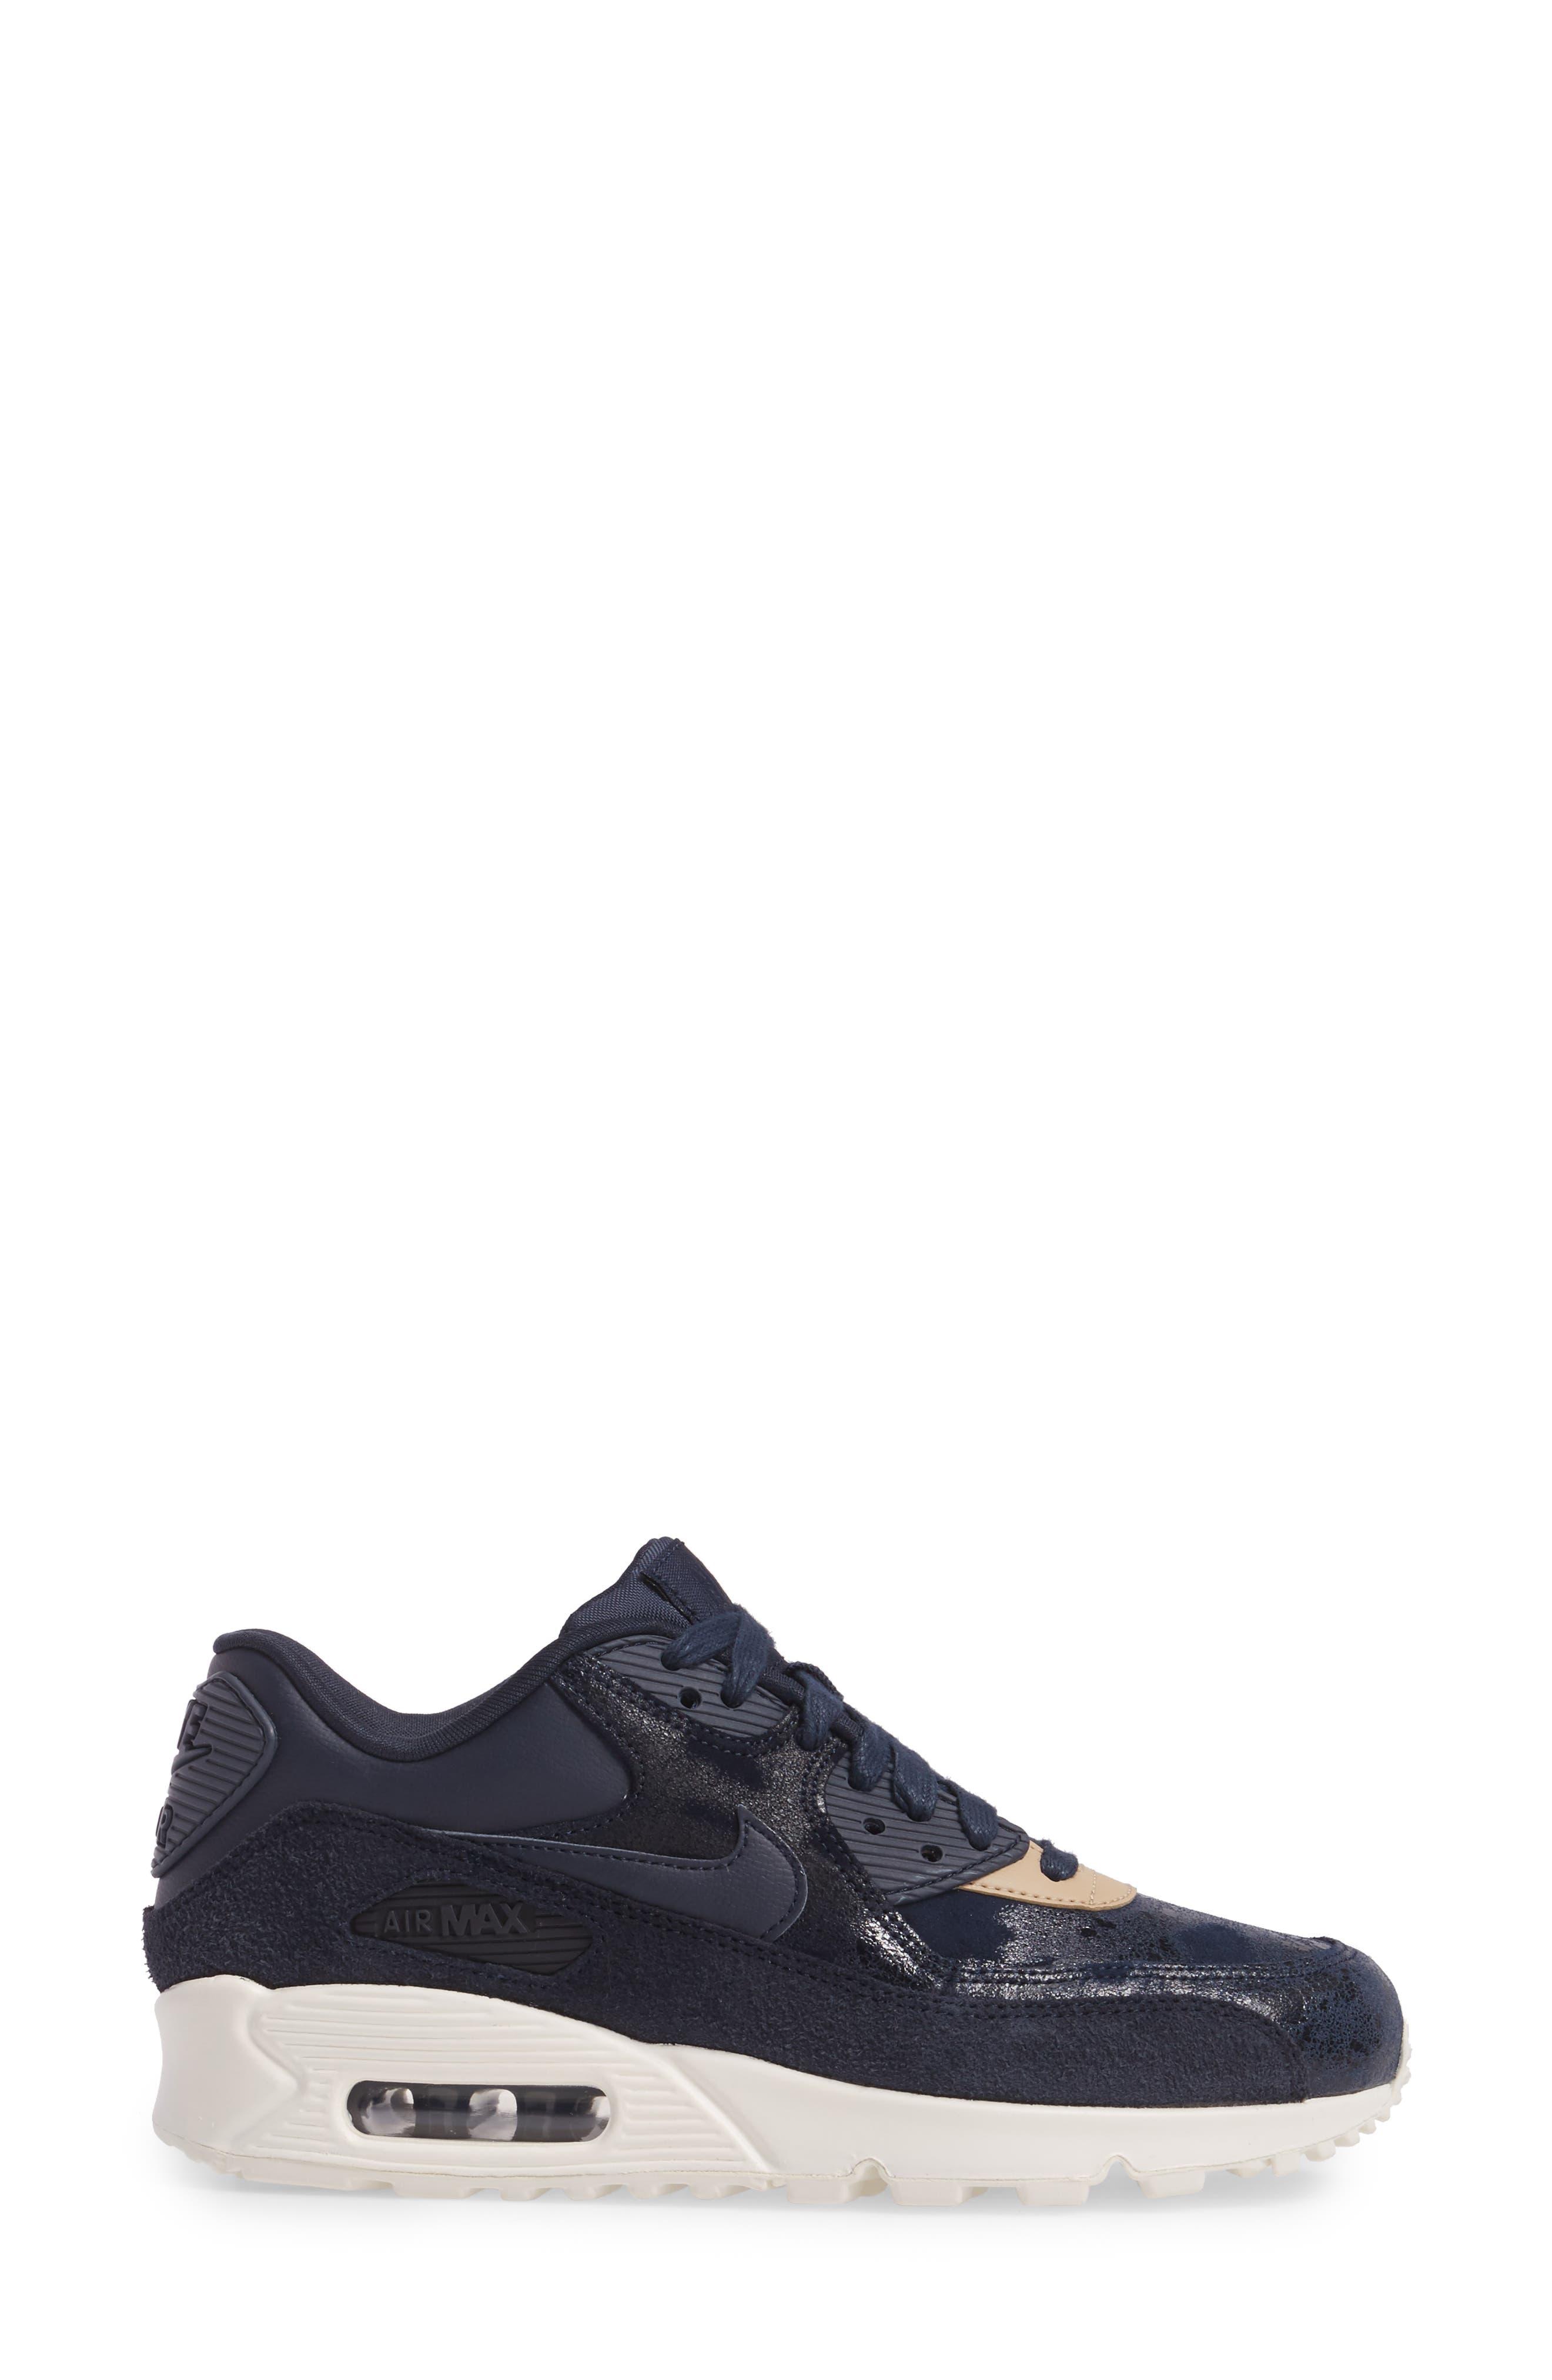 Air Max 90 Premium Sneaker,                             Alternate thumbnail 3, color,                             Dark Obsidian/ Sail/ Mushroom